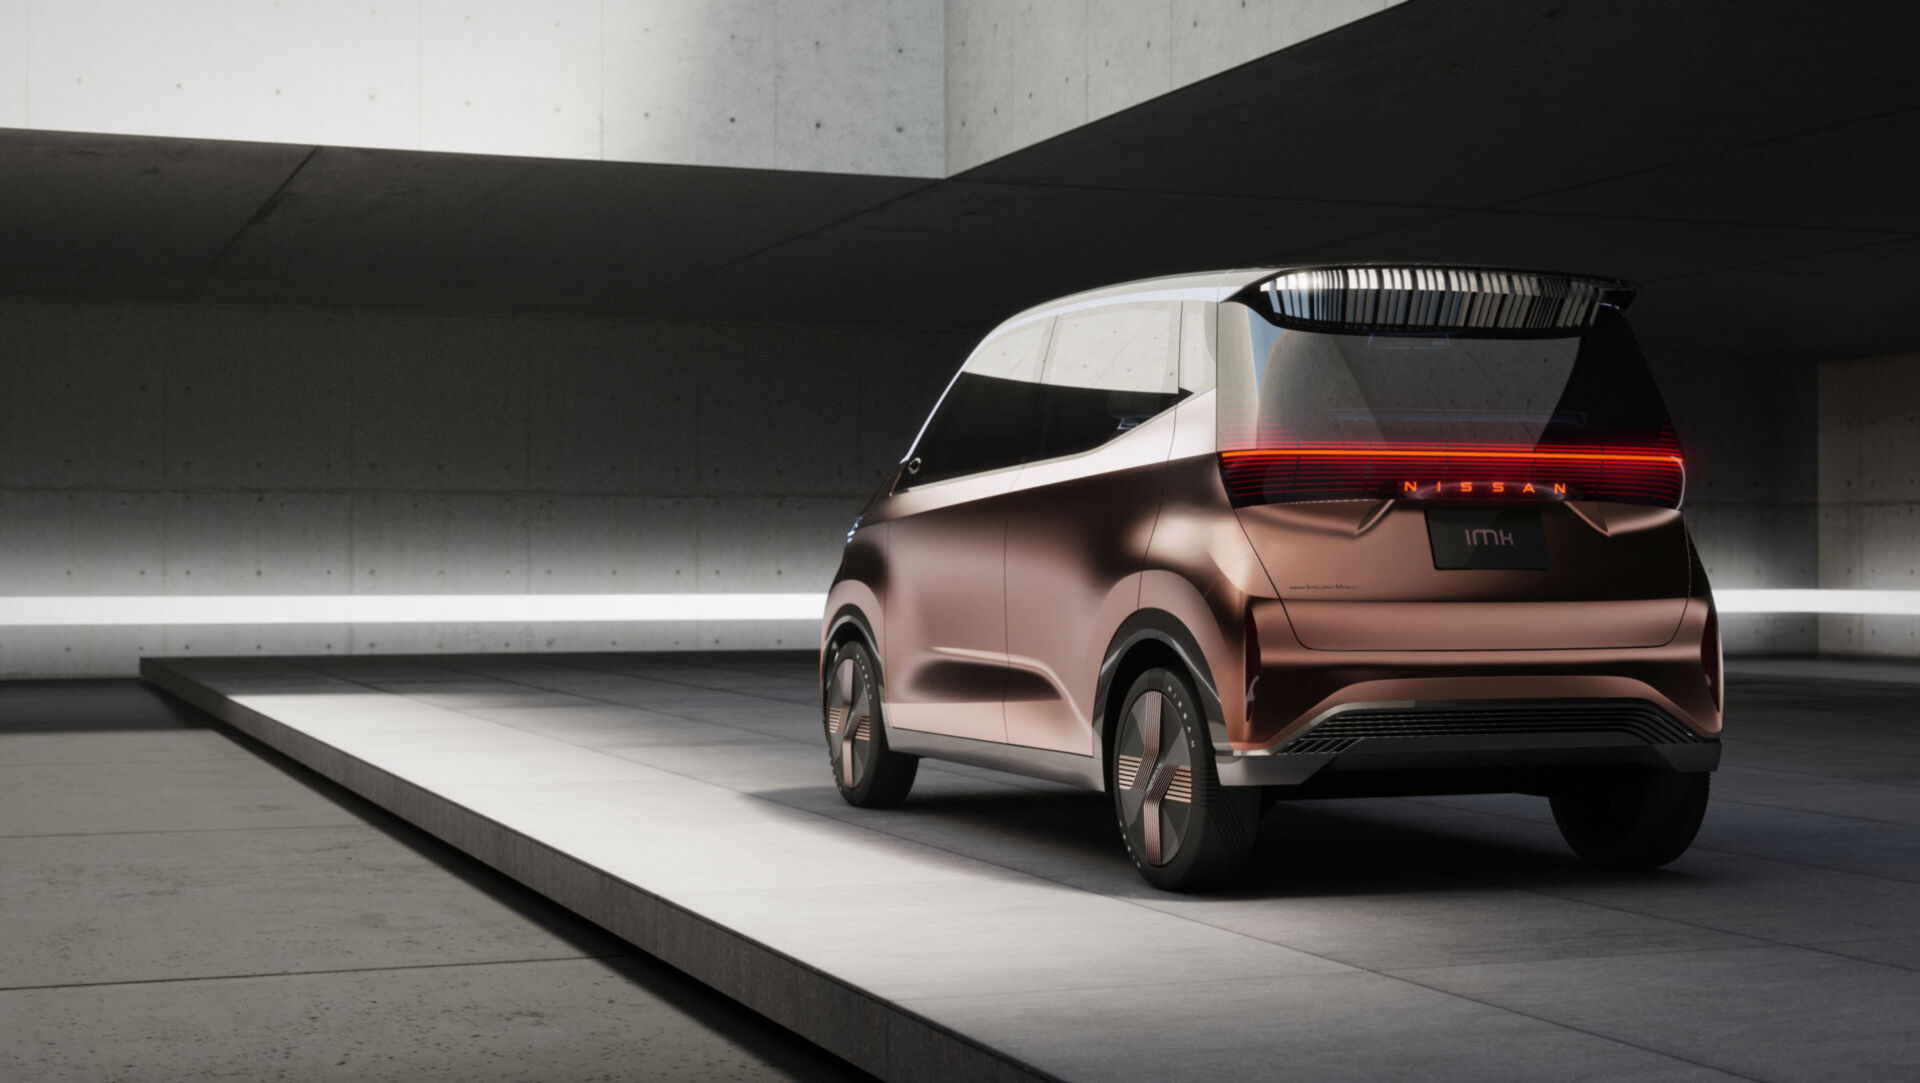 Concept Kei Car Nissan